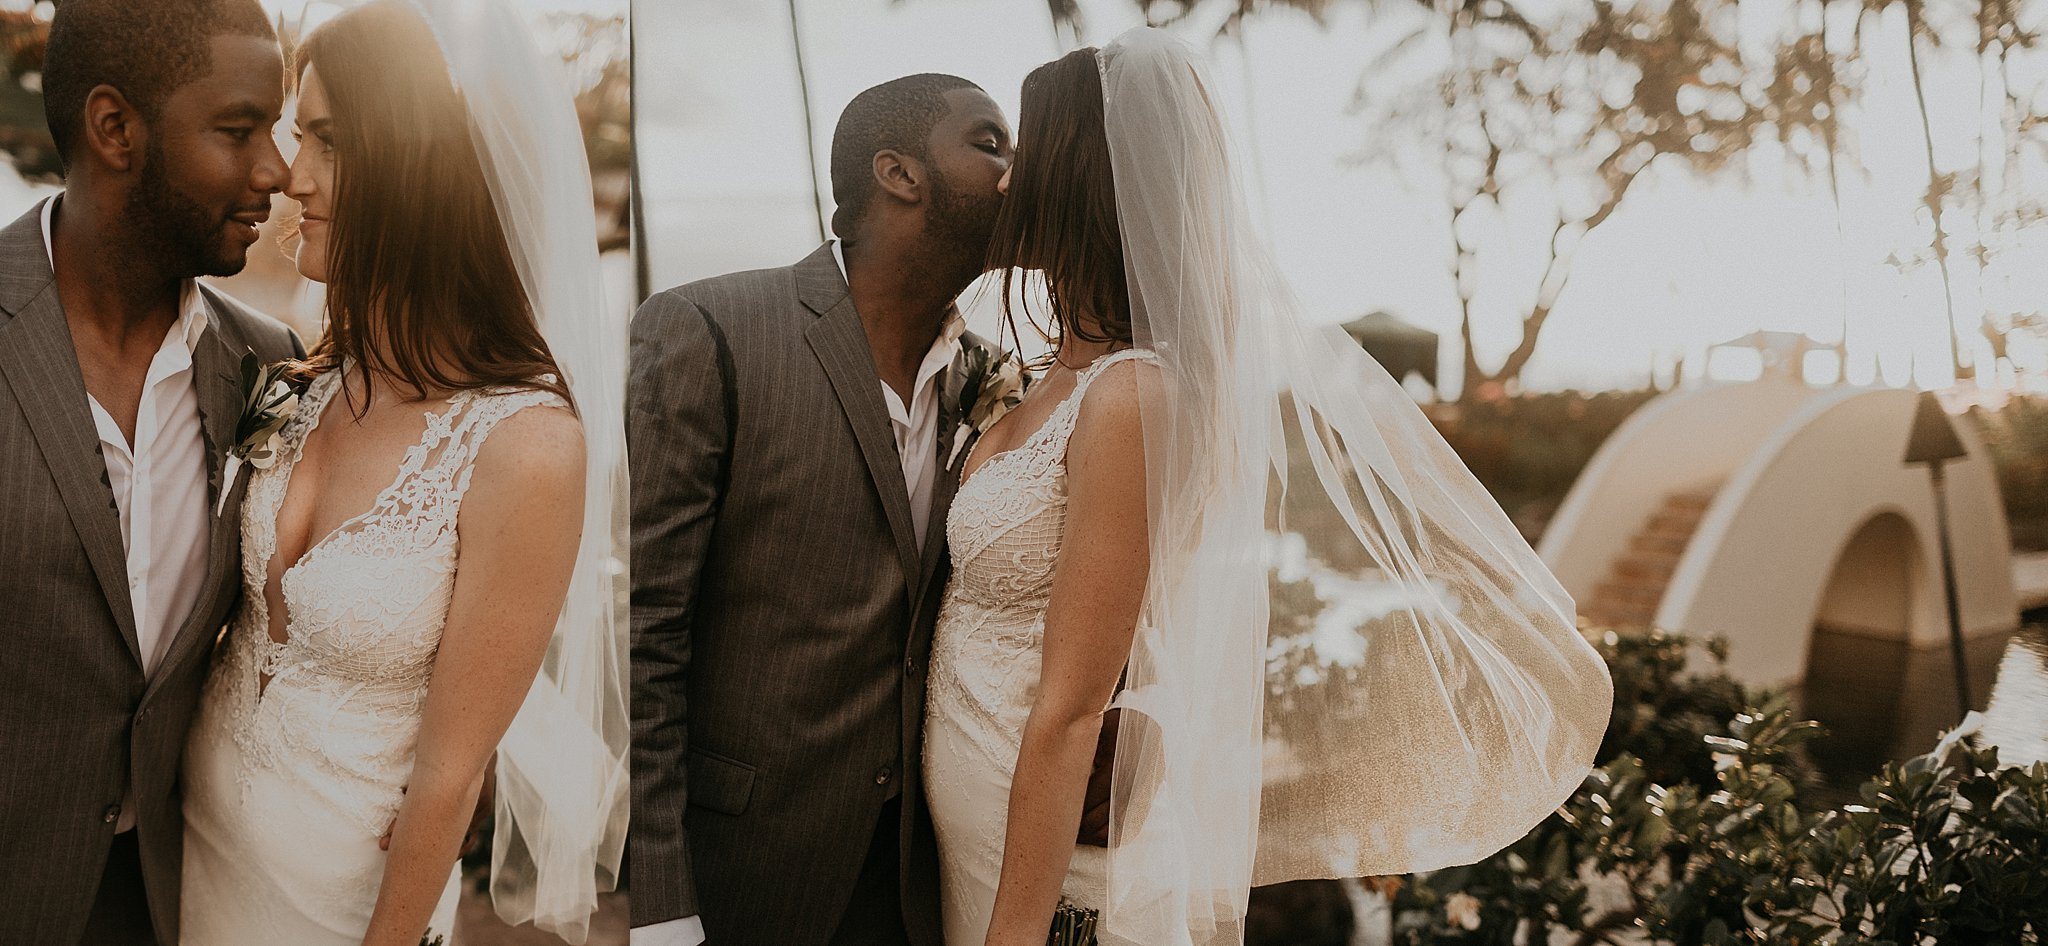 samantha_mcfarlen_bellingham_washington_engagement_photography_seattle_wedding_photographer_0236.jpg